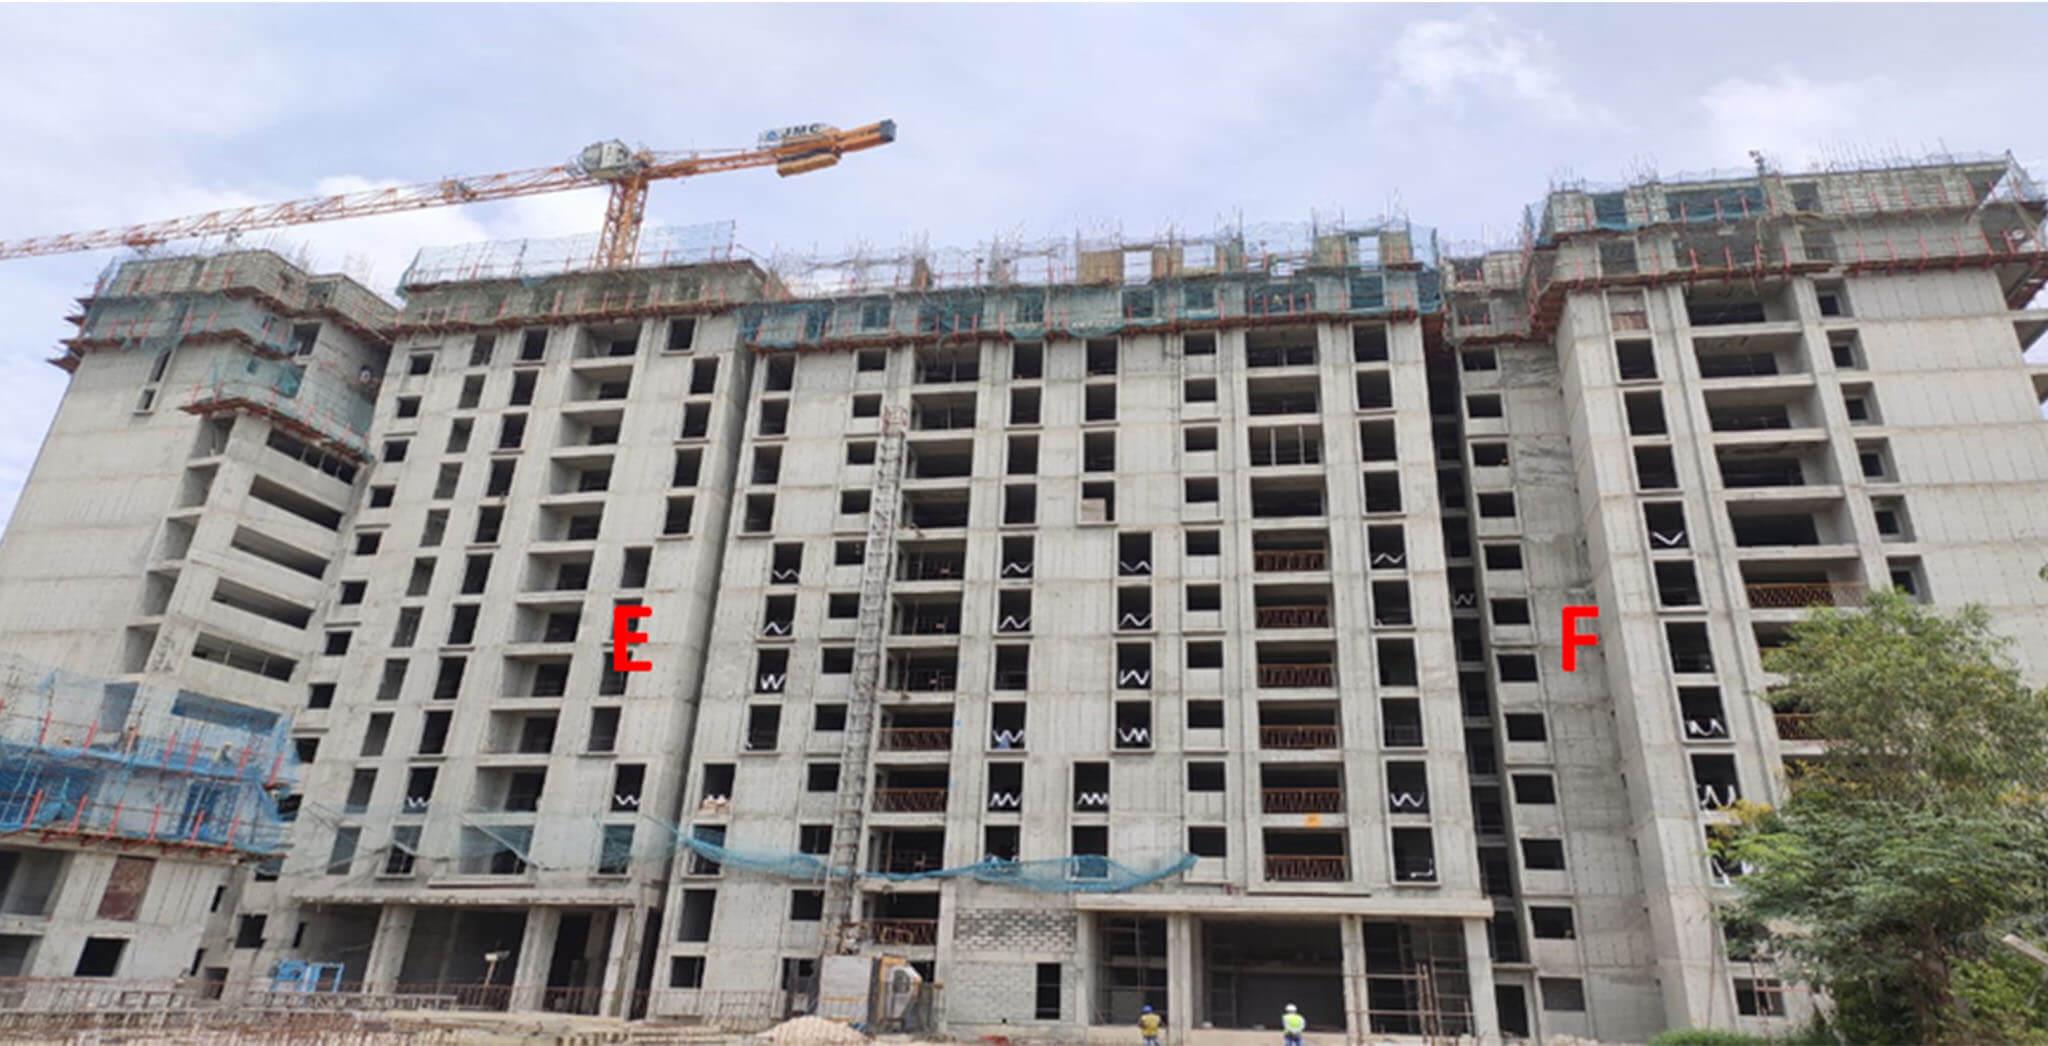 Sep 2020 - Serene: Tower E—14th floor slab structure work completed; Tower F—14th floor slab structure work-in-progress